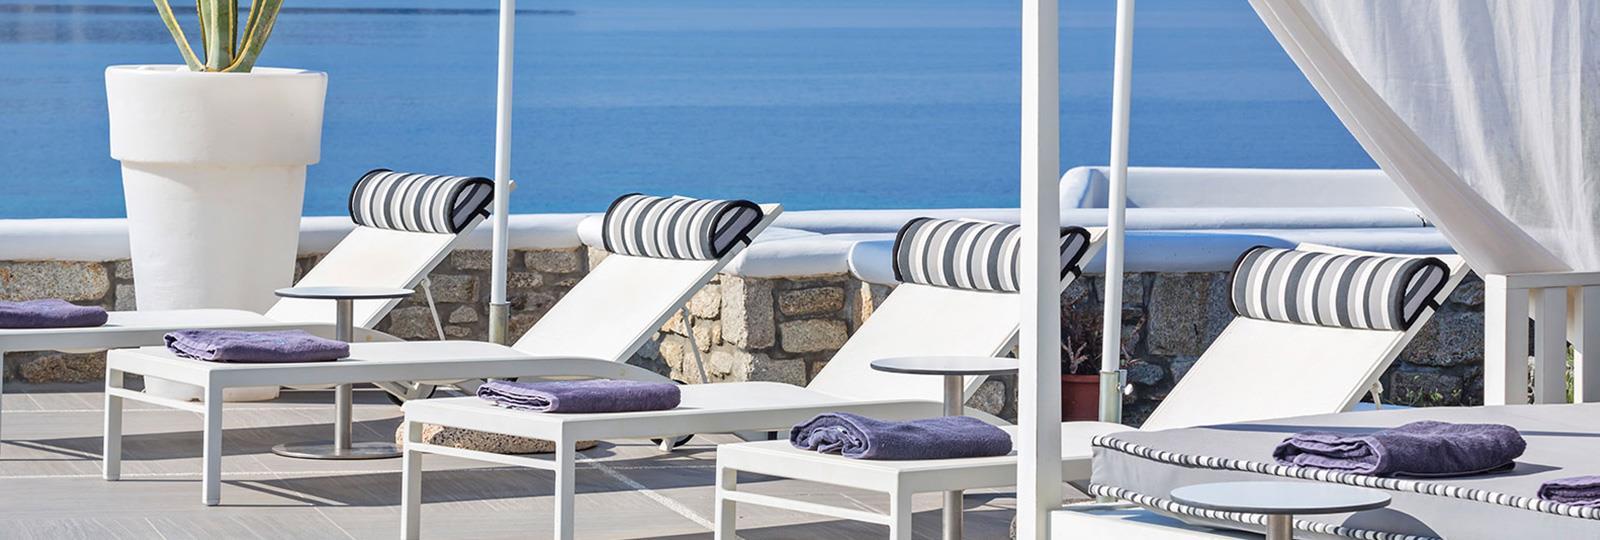 https://travel.ekupi.eu/Images/sliderHorizontal/hoteloffers/Hoteli_pp_1600x540_mykonos.jpg